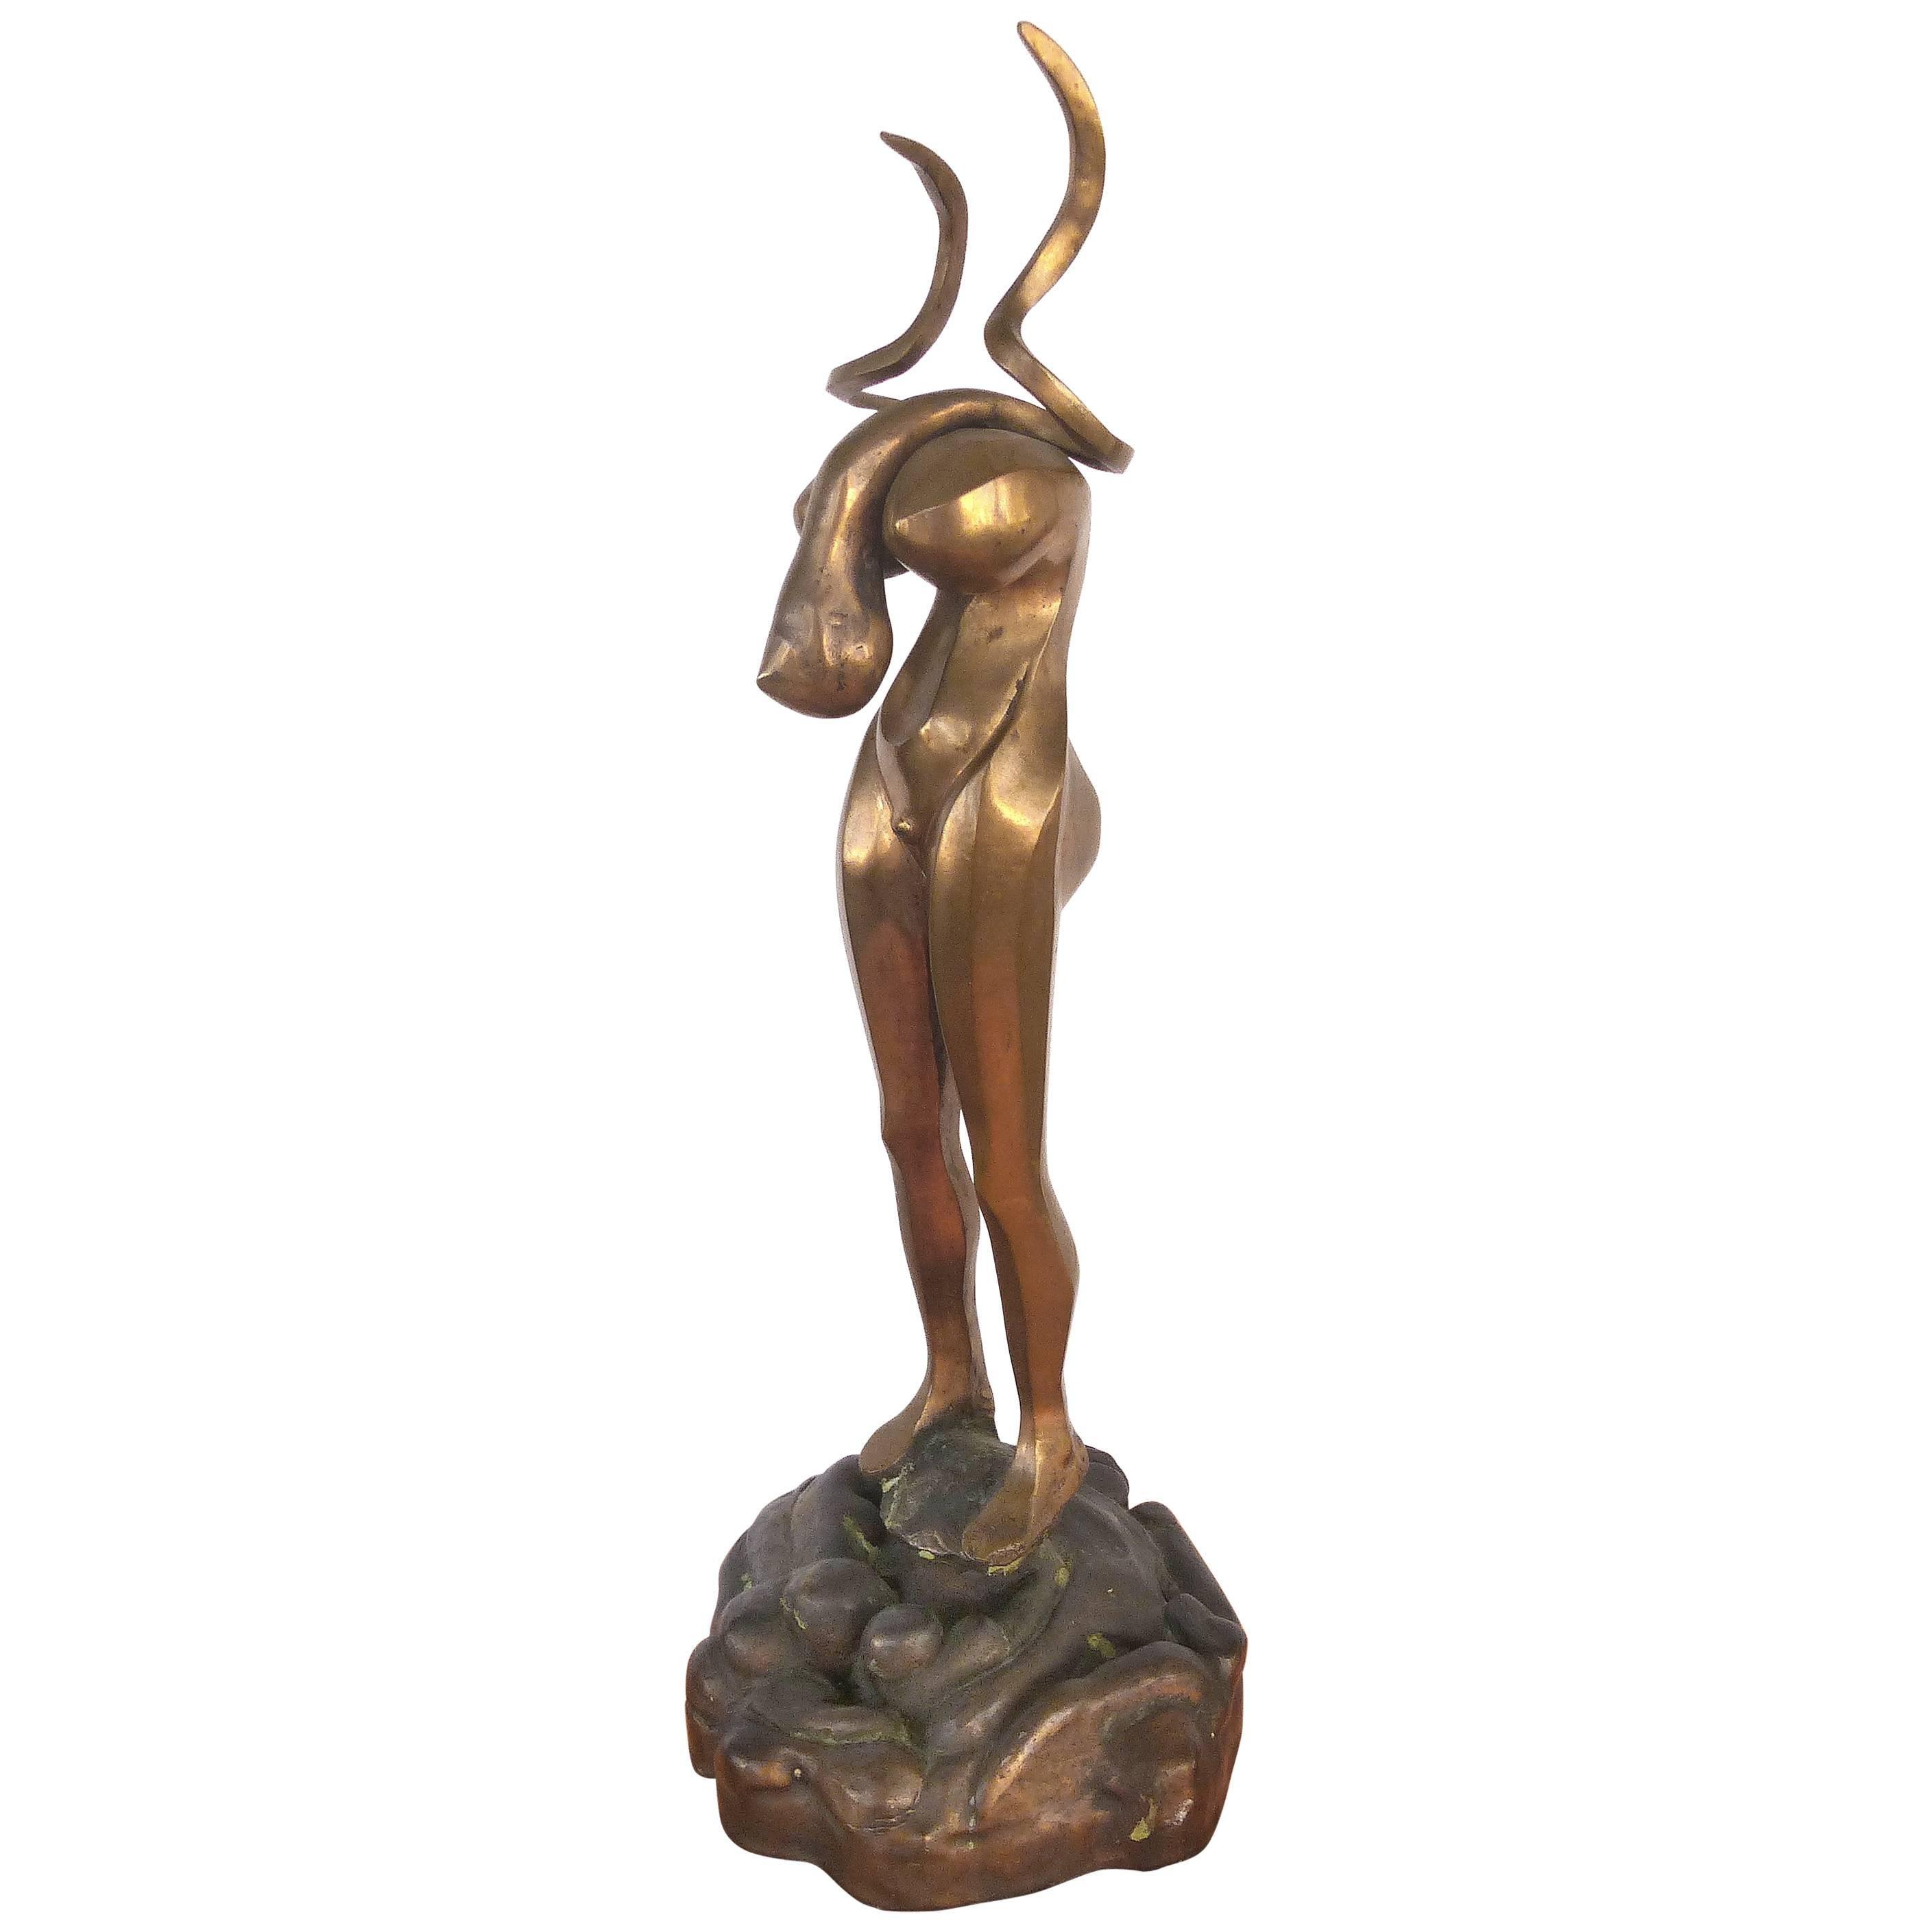 Surrealist Figurative Bronze Signed Zuñiga and Dated, 1977